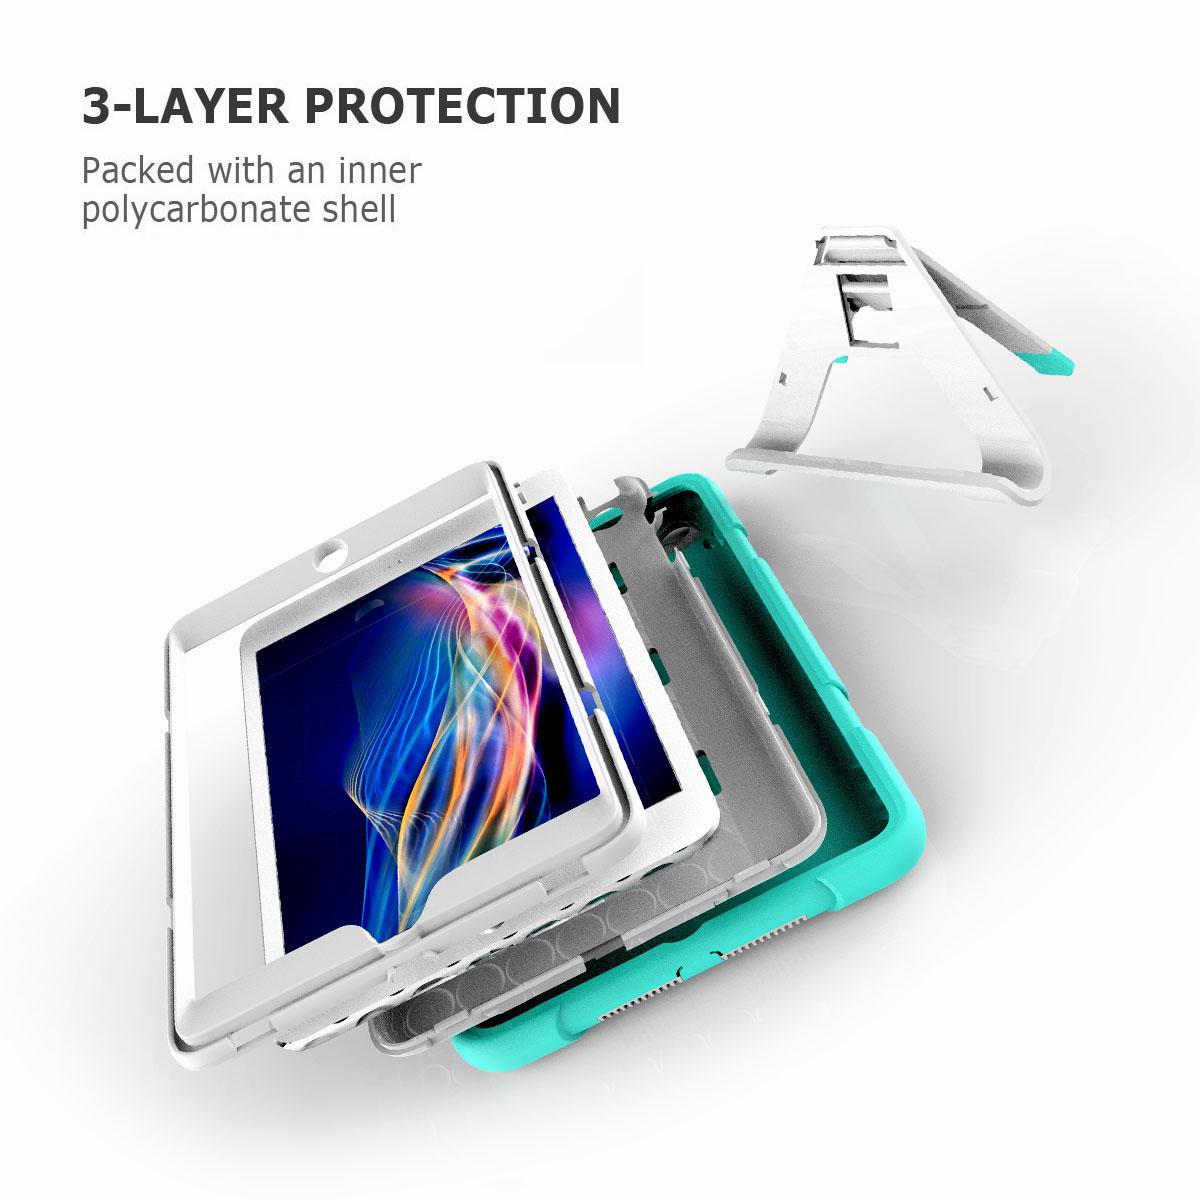 Luxury-Shockproof-Tough-Armor-with-Hard-Kickstand-Case-For-Apple-iPad-Mini-1-2-3 thumbnail 16